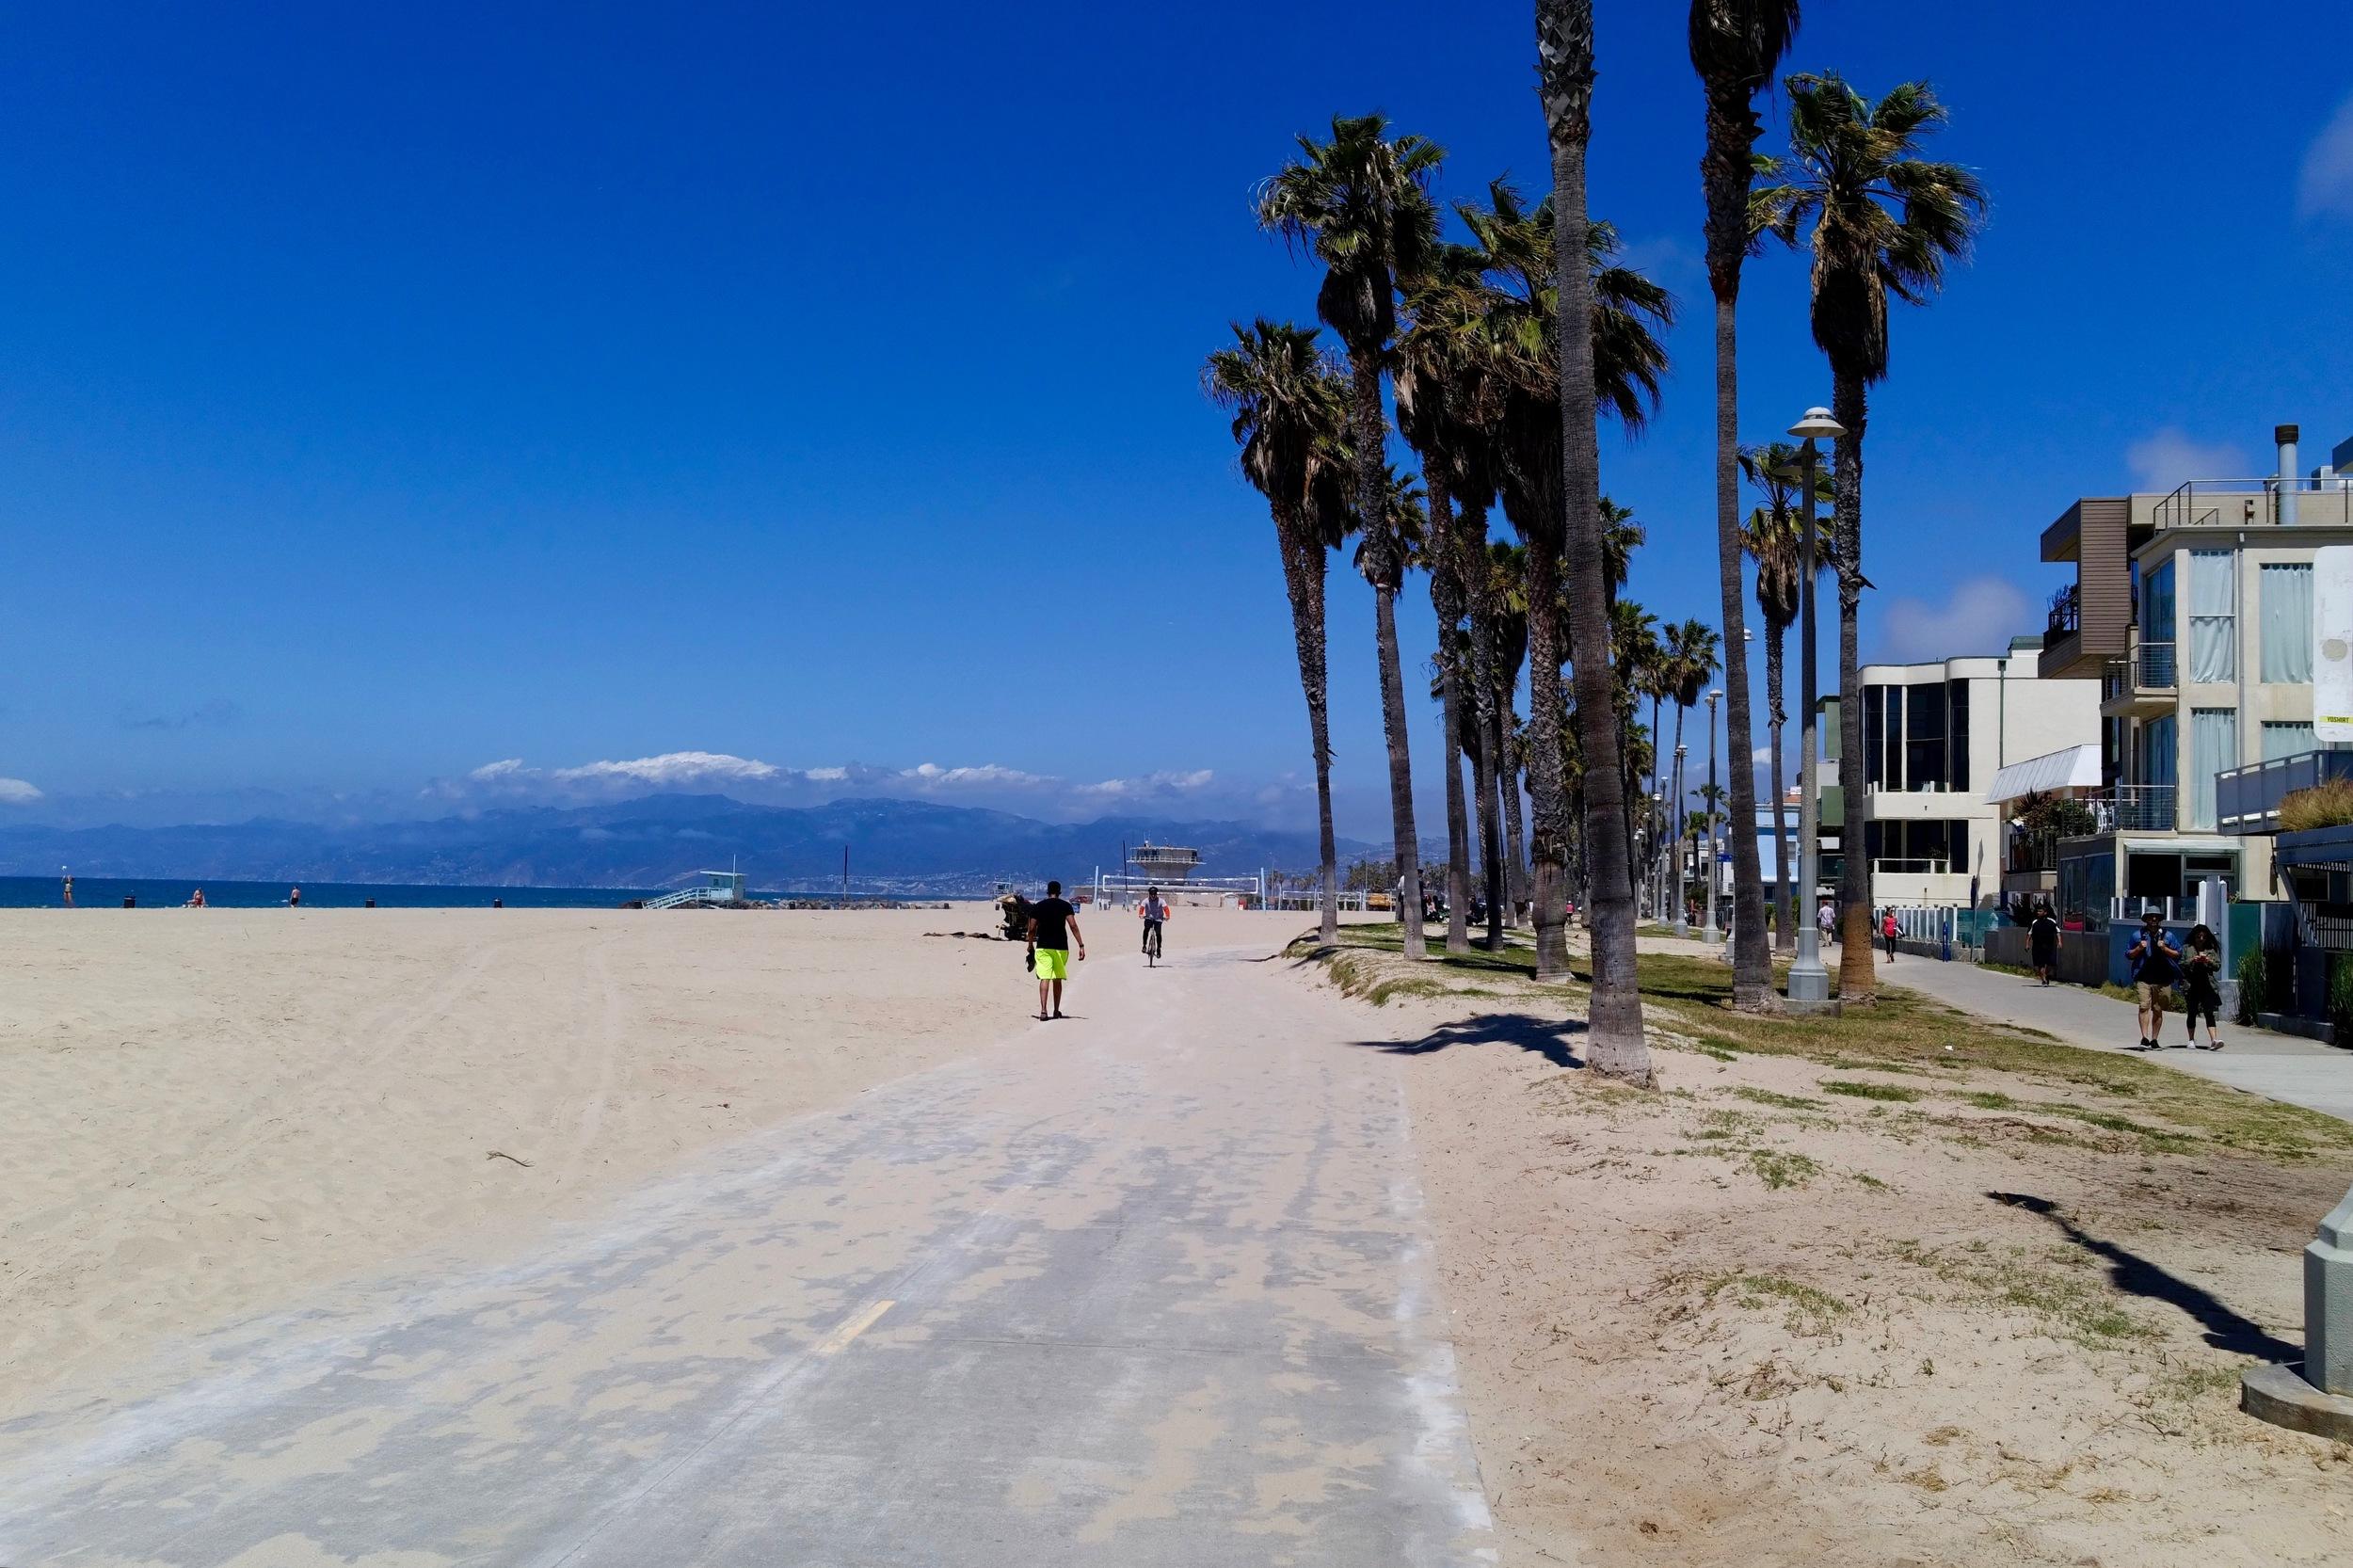 The extraordinary beachfront in Venice.